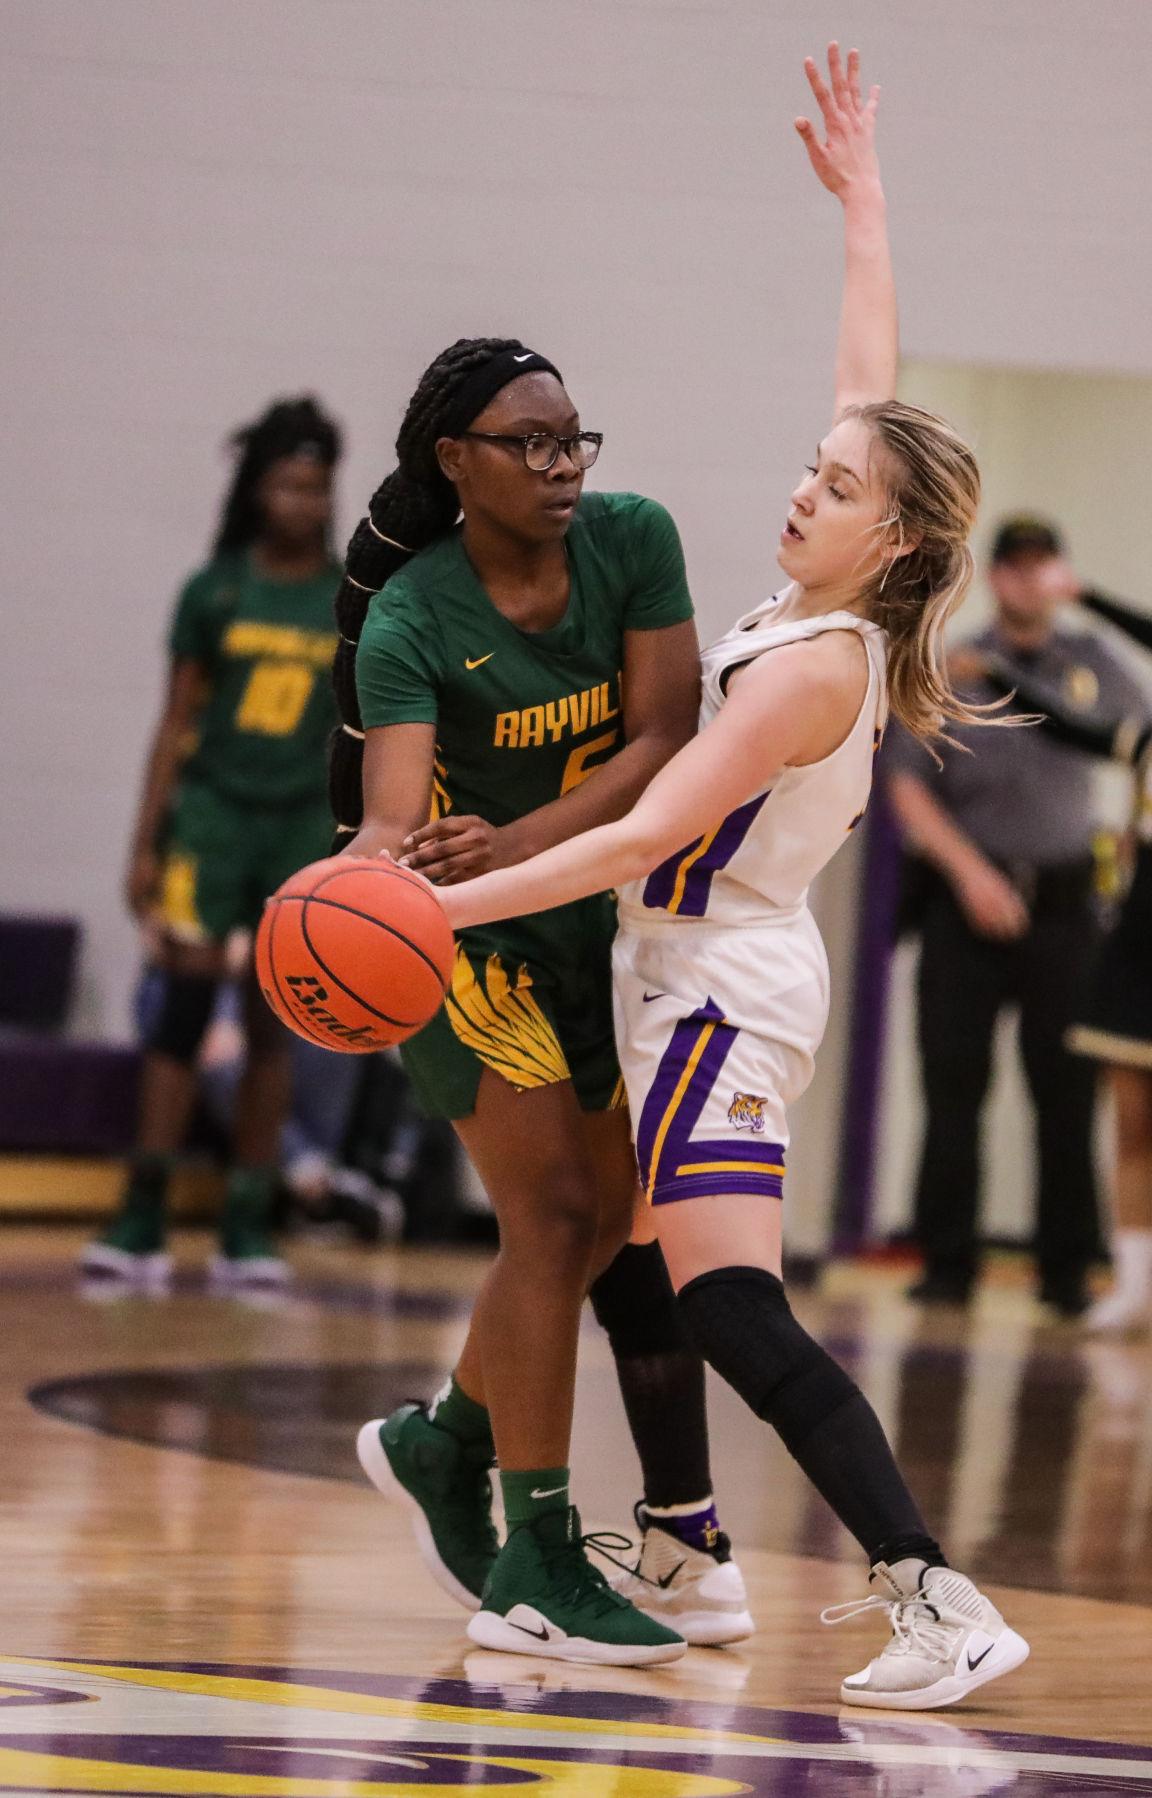 Rayville at Doyle girls basketball Presleigh Scott